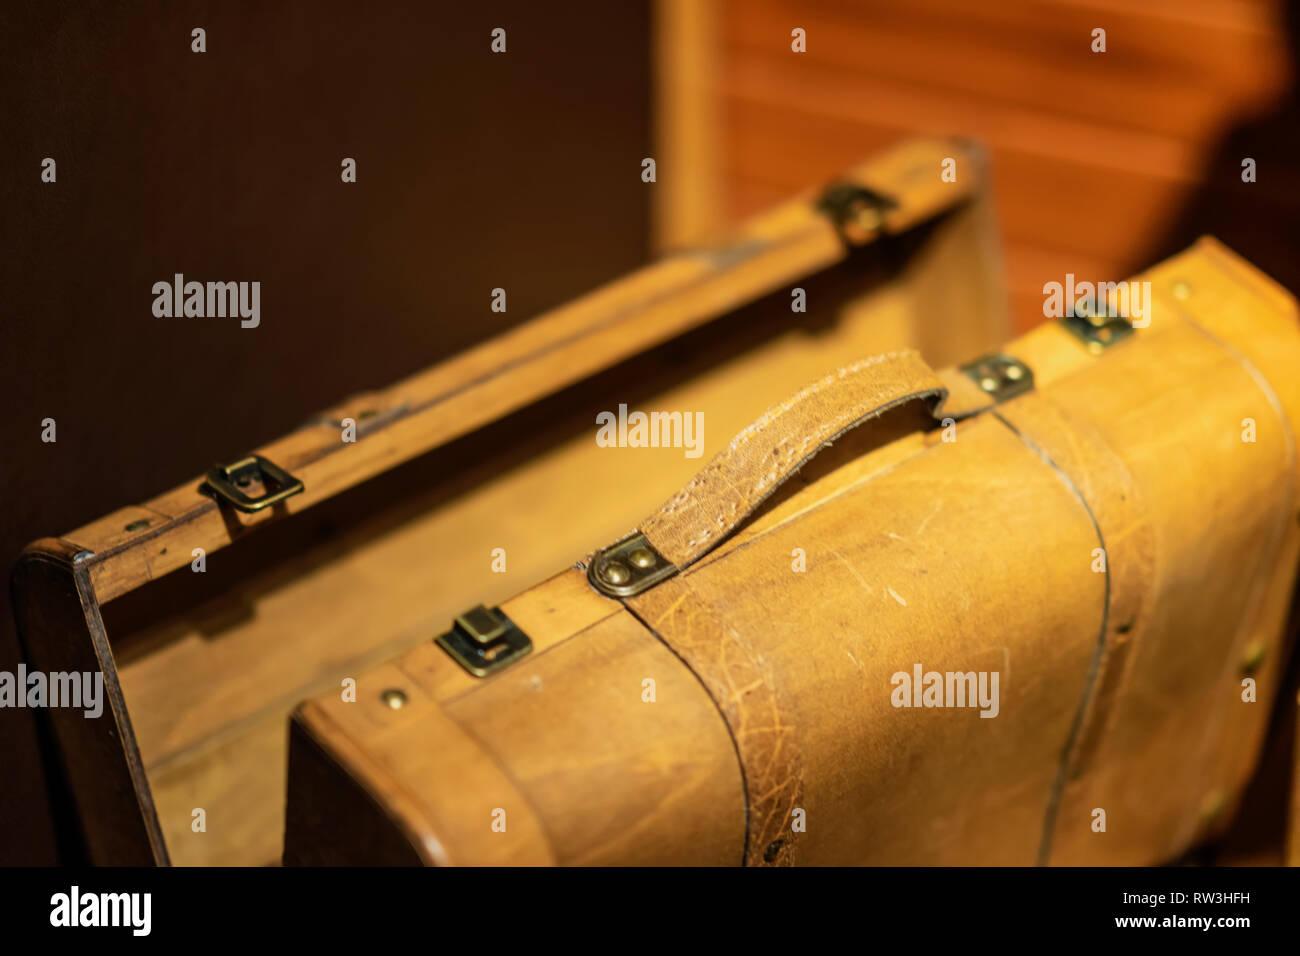 Maleta de madera amarilla para viajar closeup, nostálgicos de equipaje, vintage antecedentes Imagen De Stock